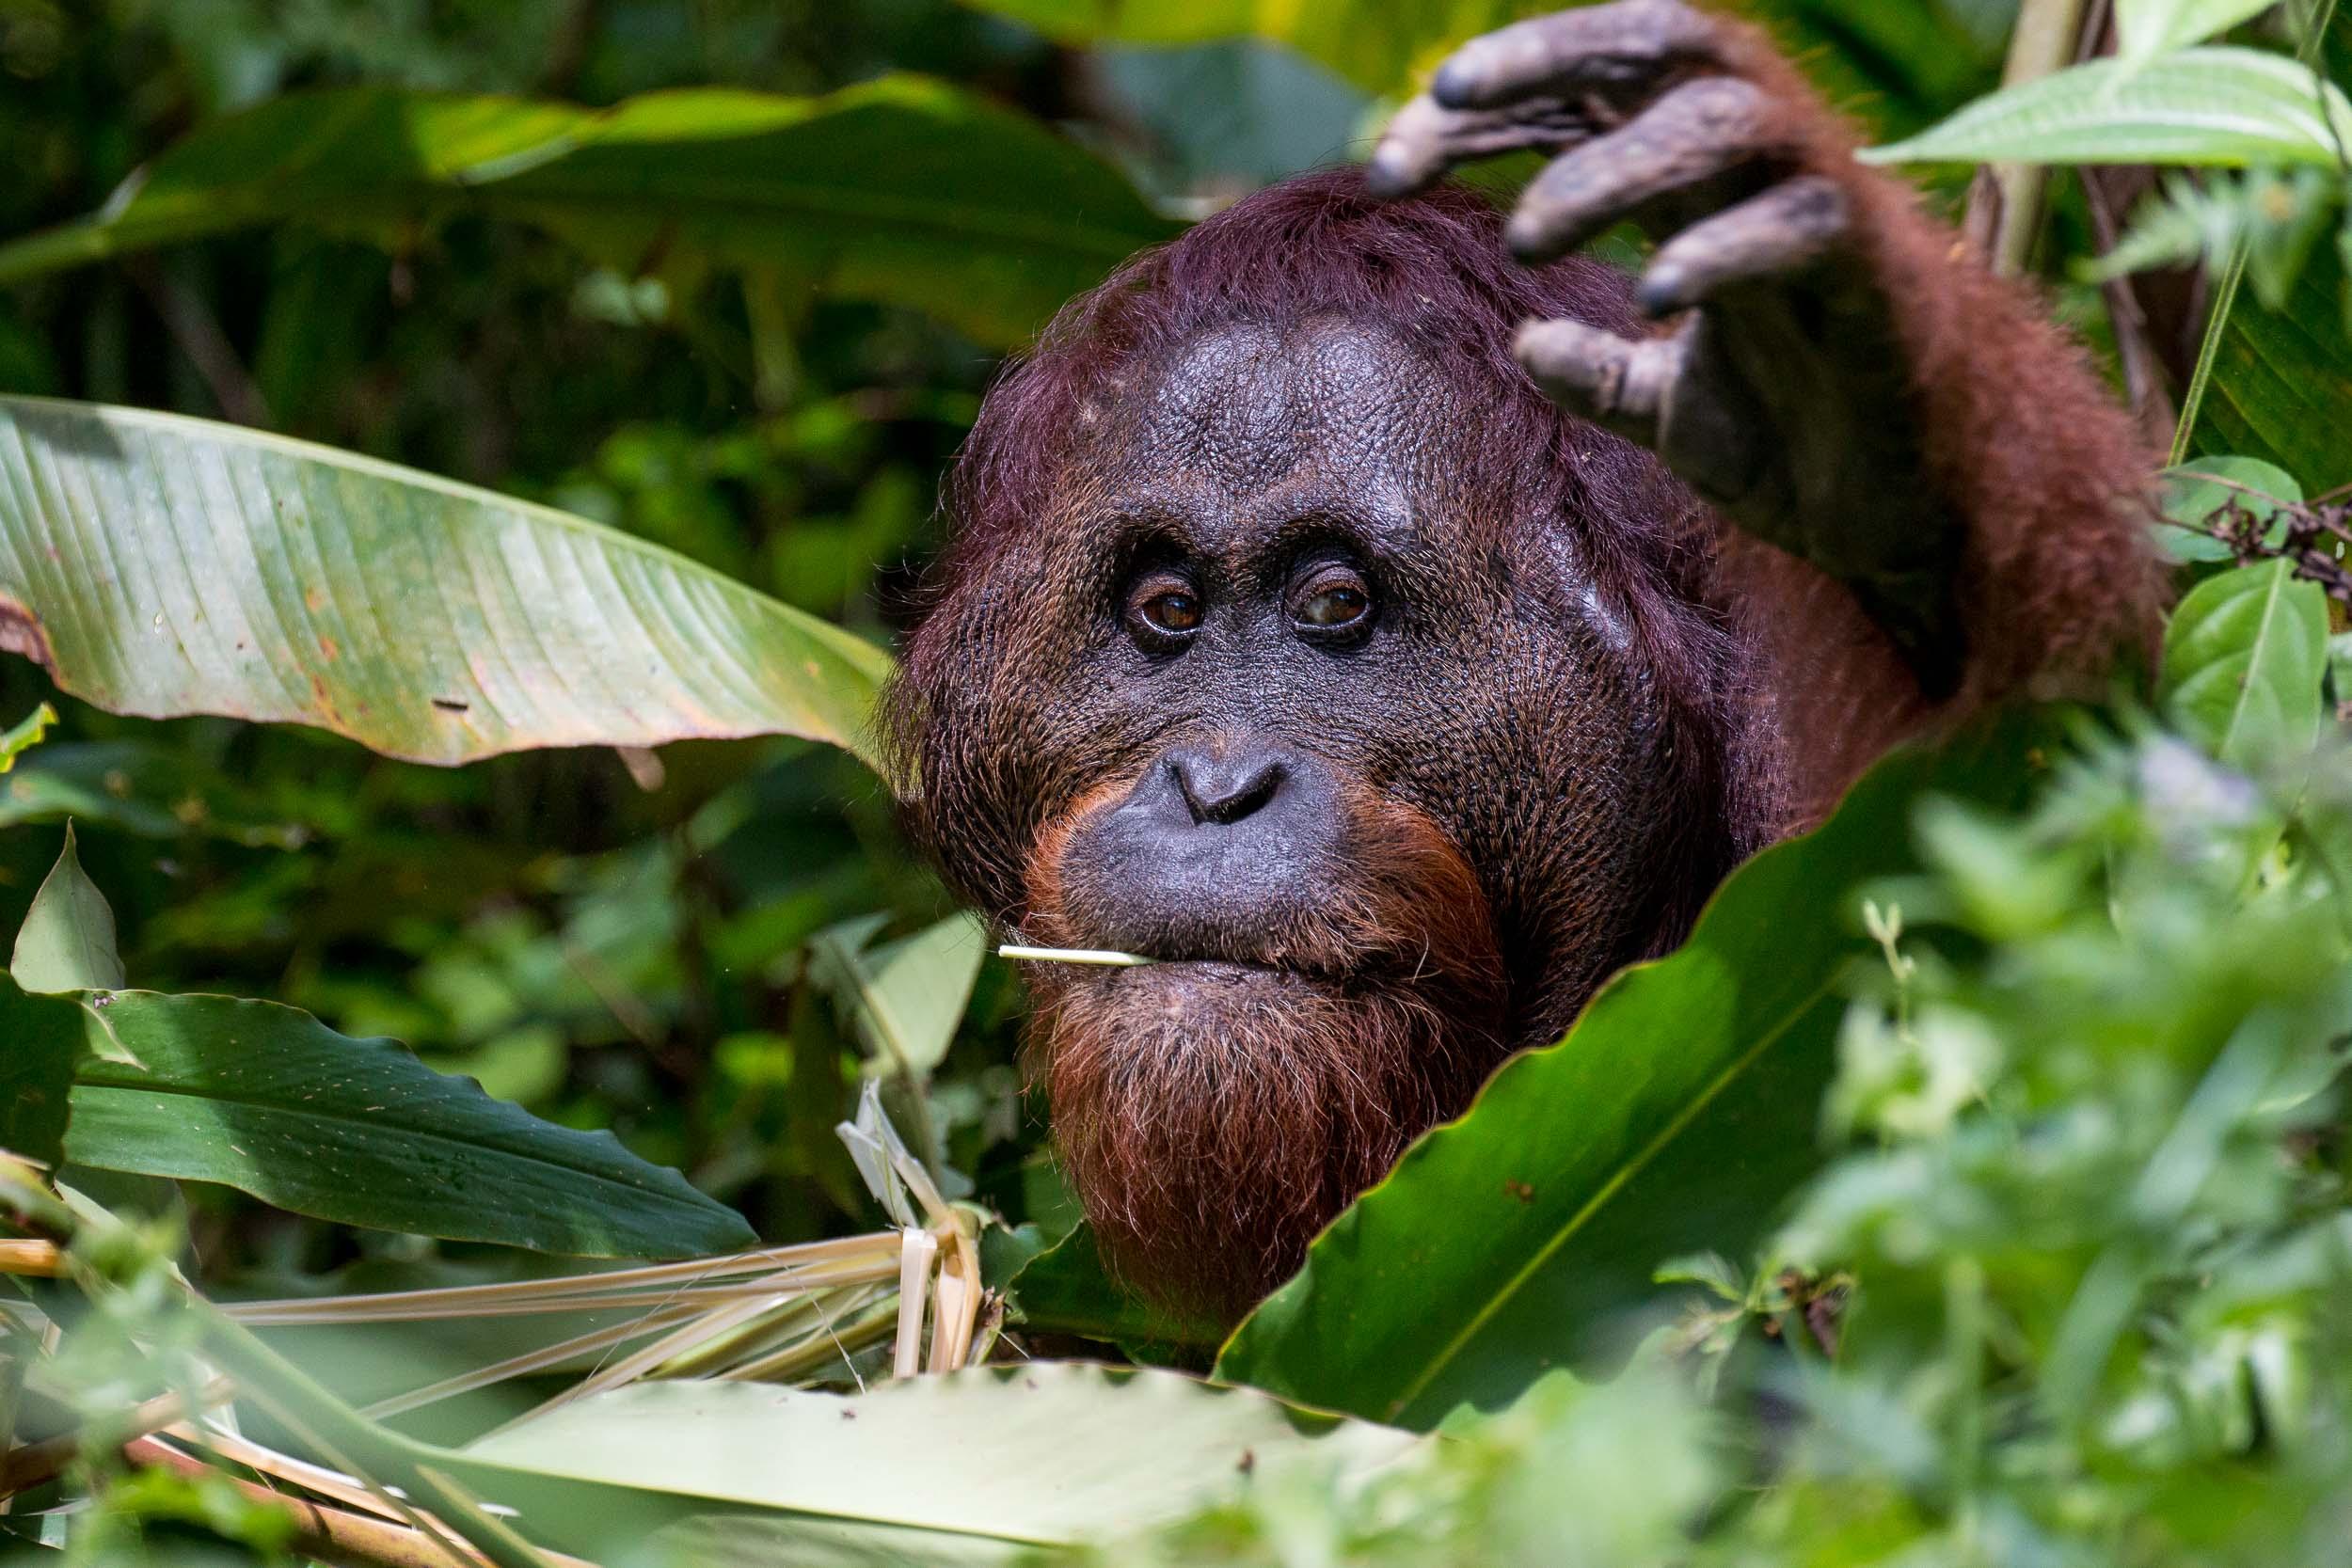 Gotenz, Large Male Orangutan with Flanged Cheeks, Danum Valley, Sabah, Borneo, Malaysia.jpg